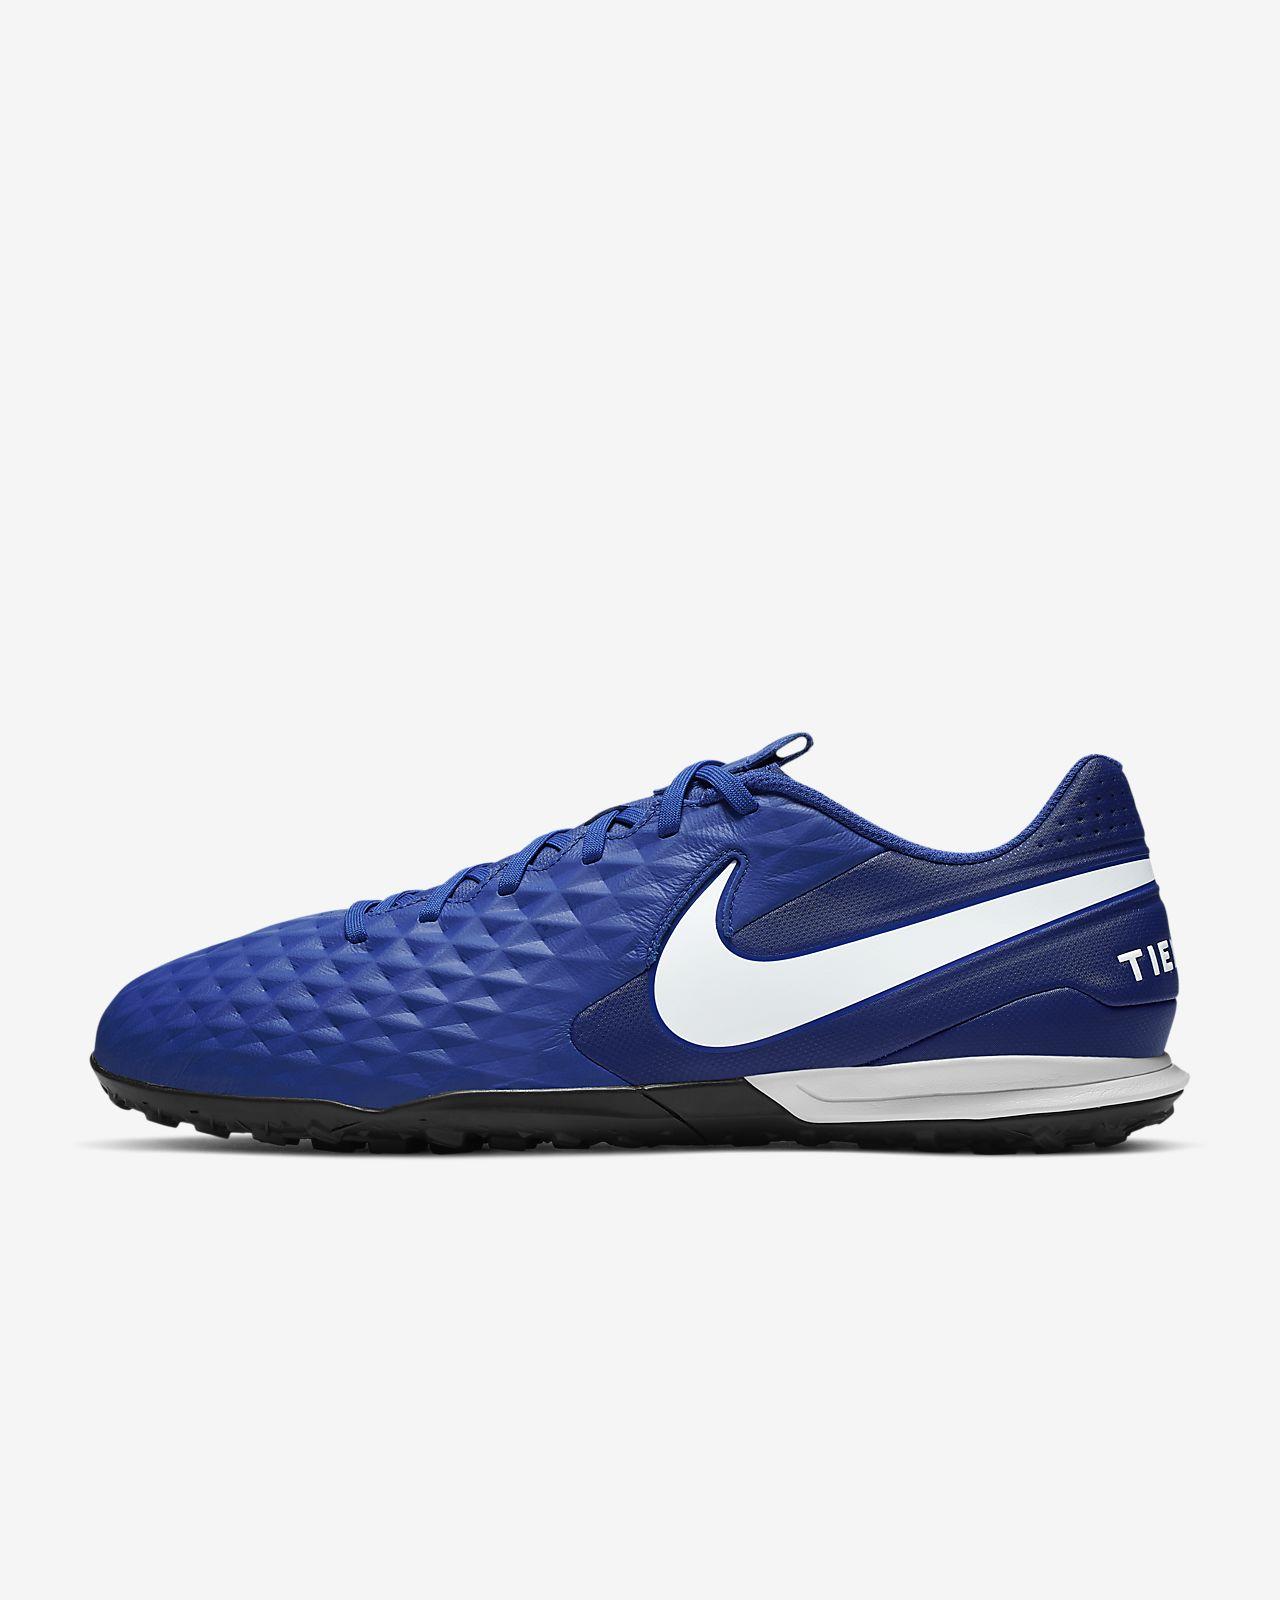 Chaussure Nike Legend De Surface Football Synthétique Tiempo 8 Pour 2YDWH9EI